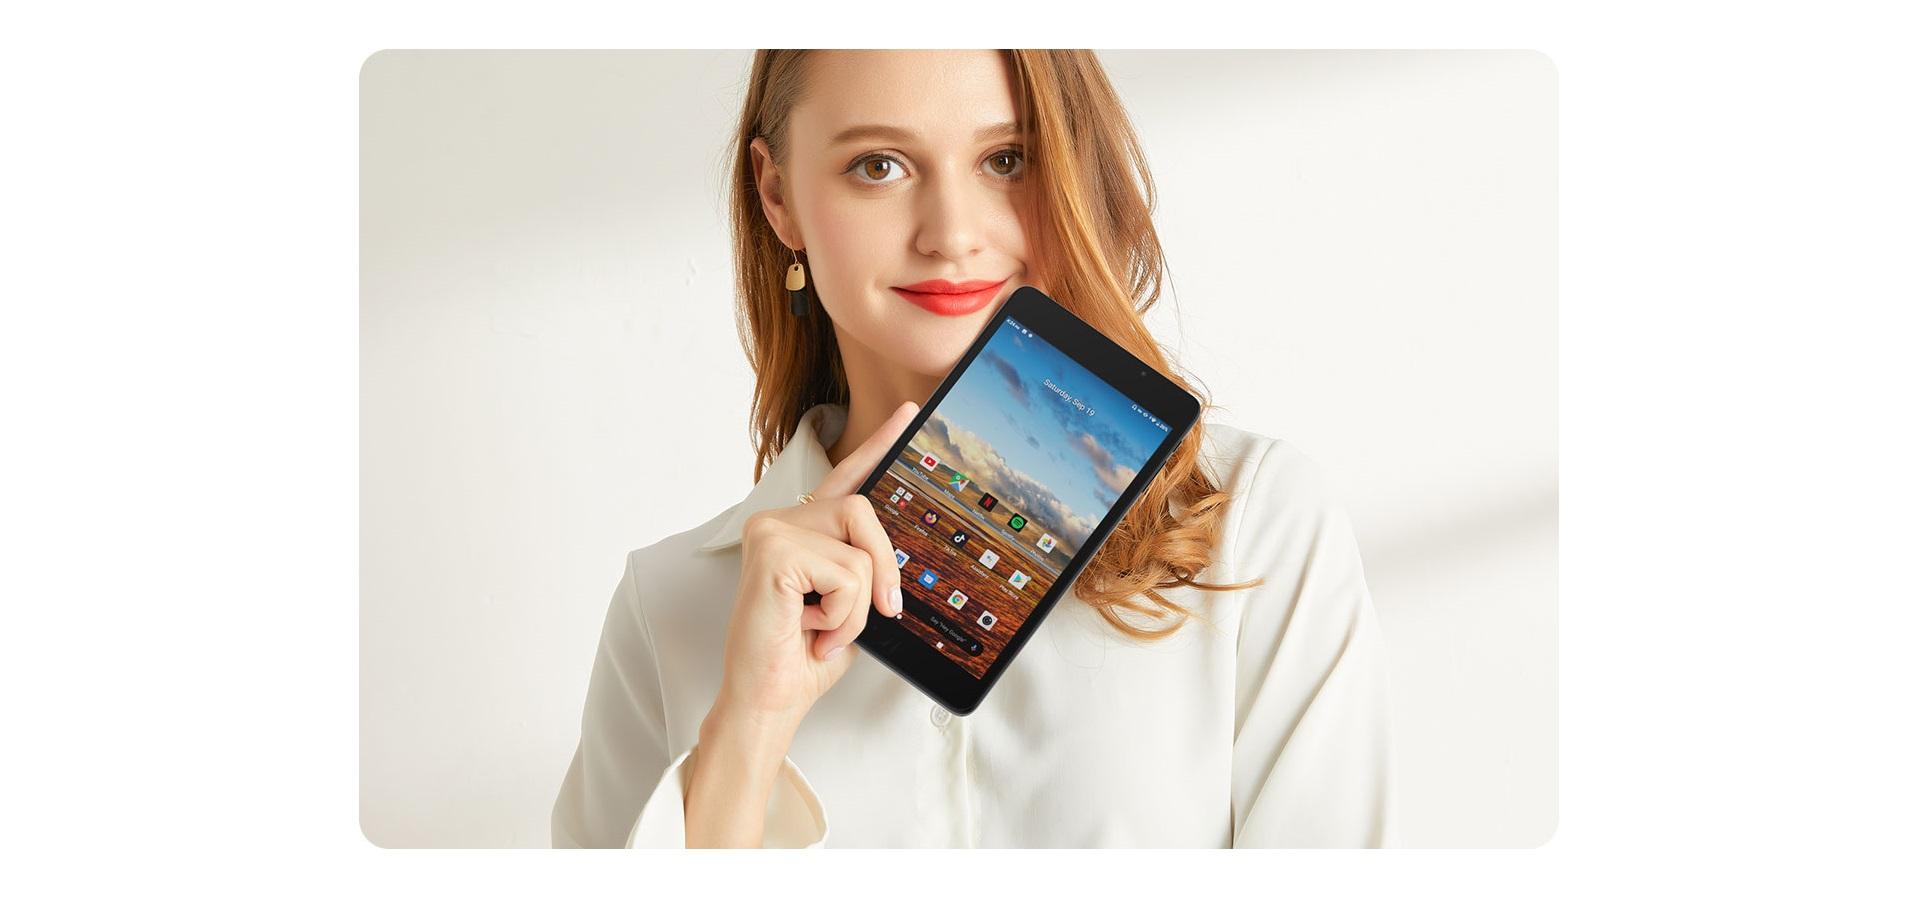 Alldocube iPlay 8T tablet